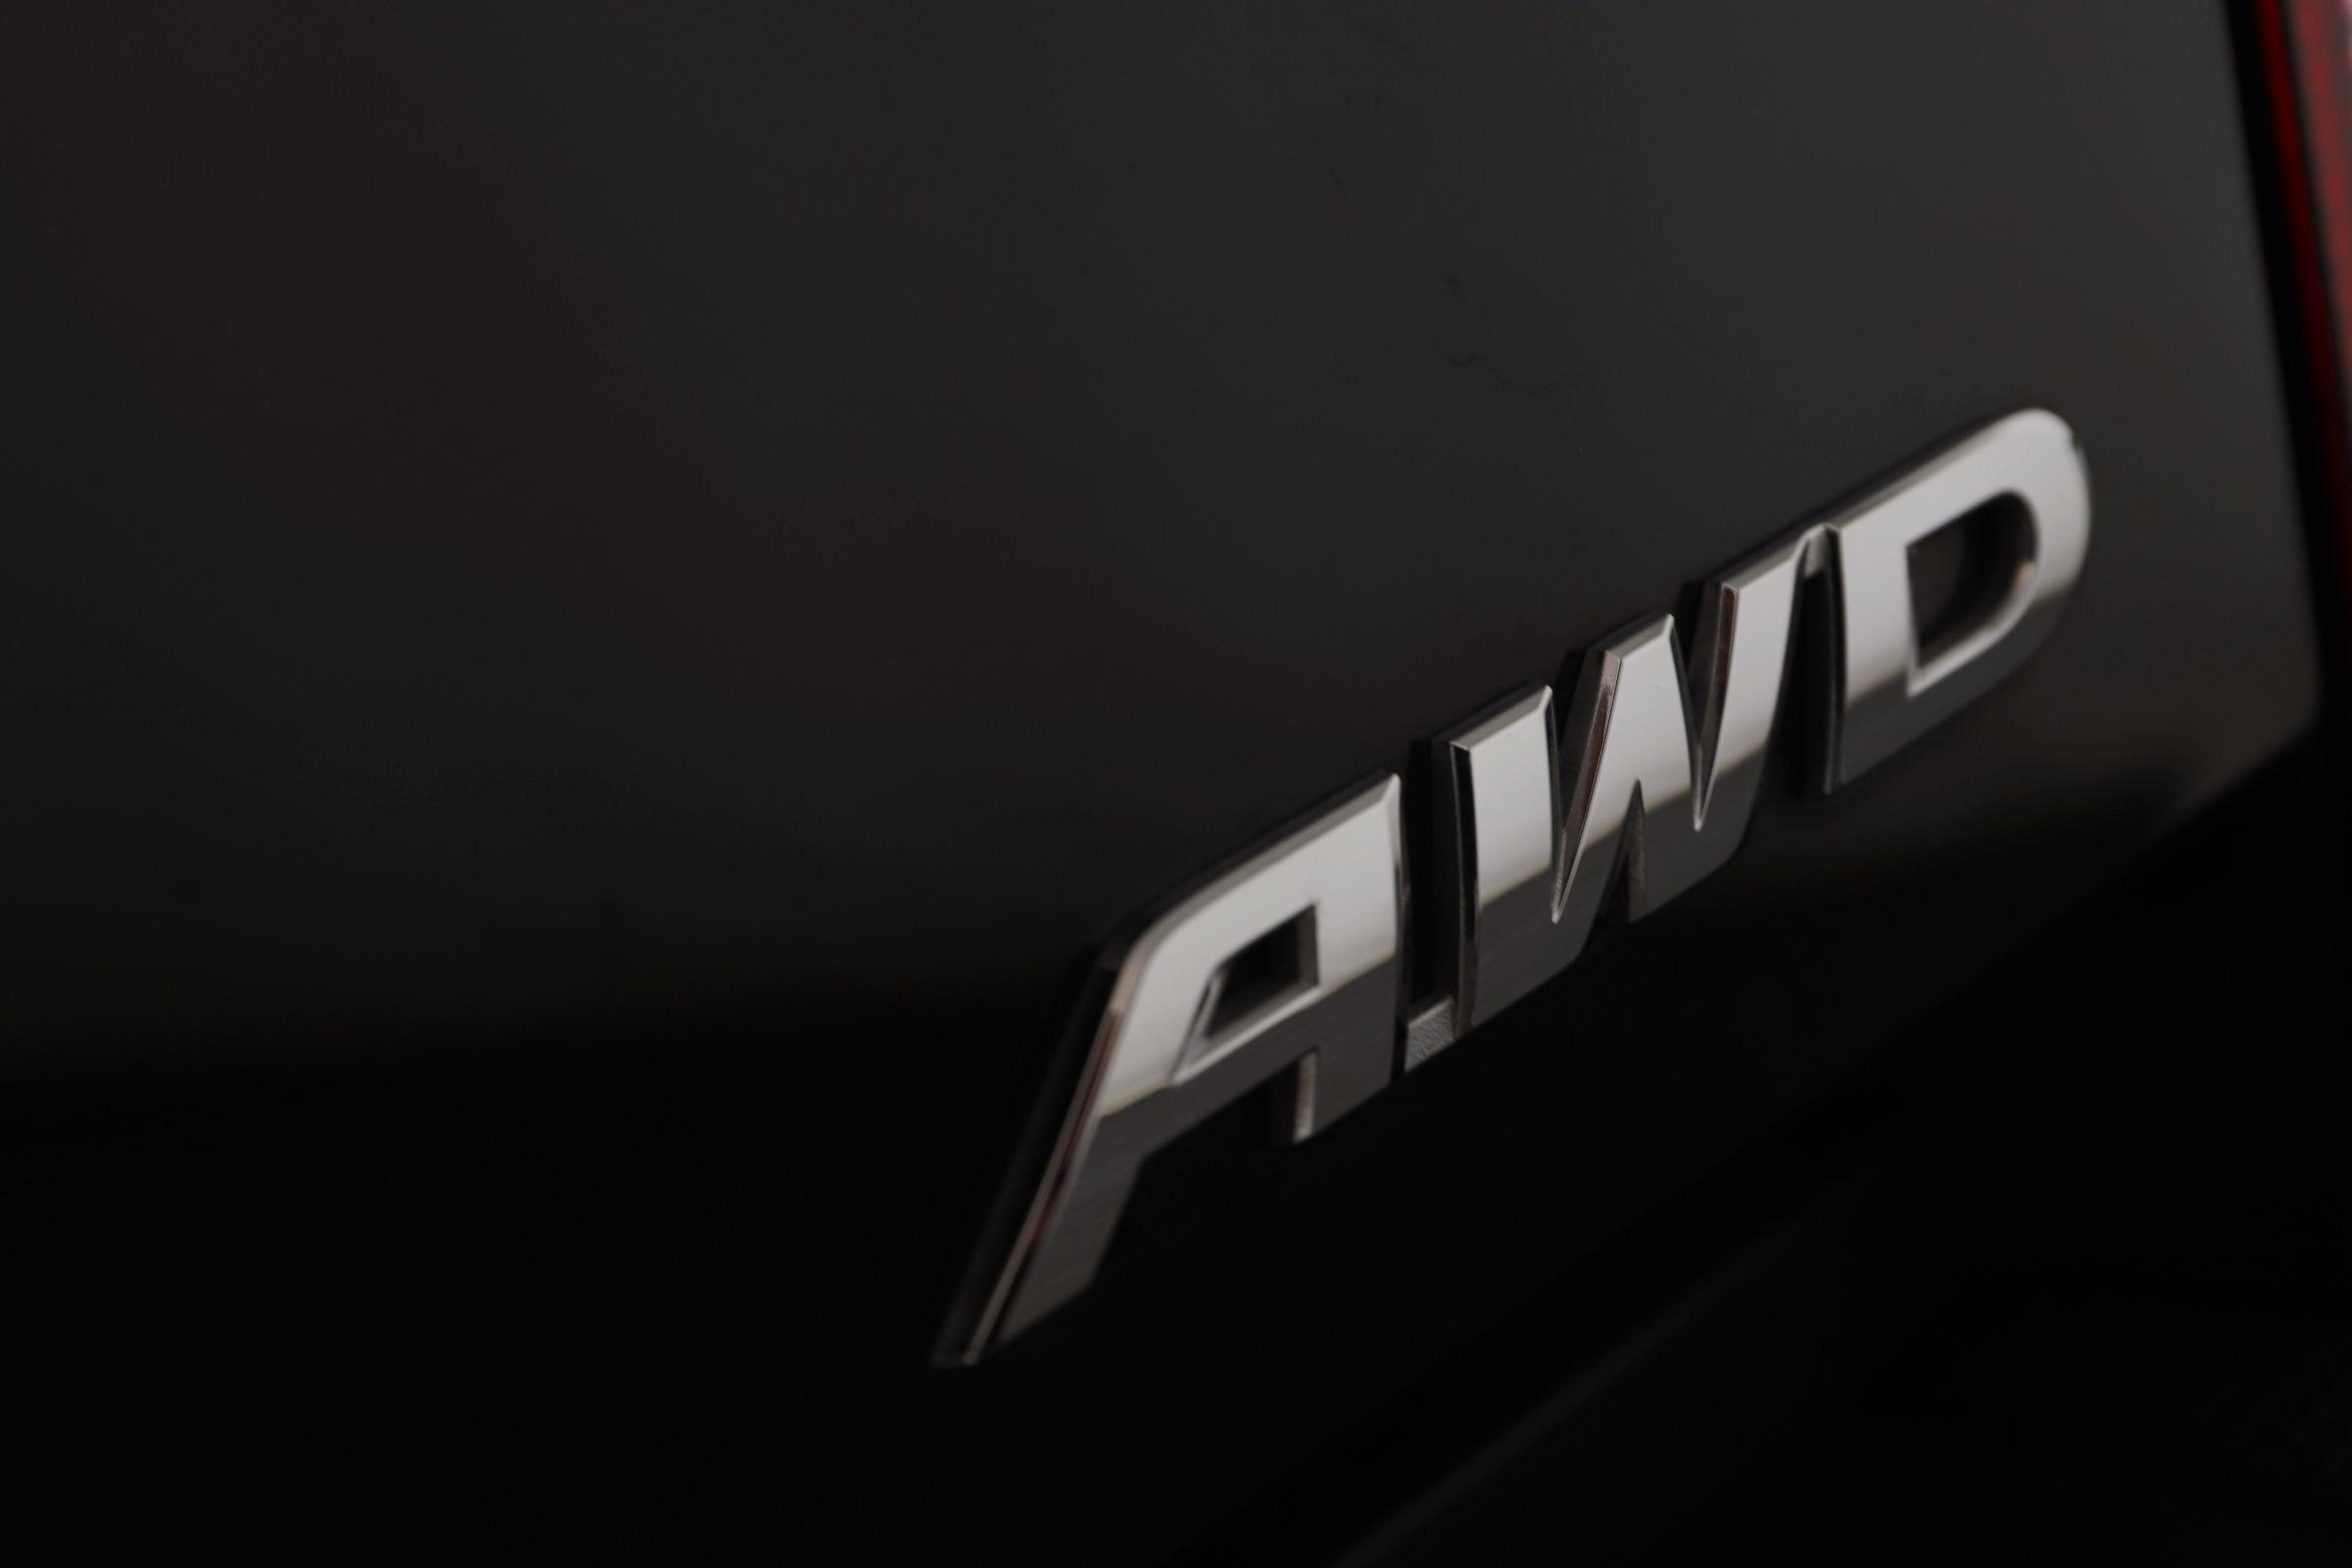 Pre-Owned 2017 Honda Ridgeline Black Edition